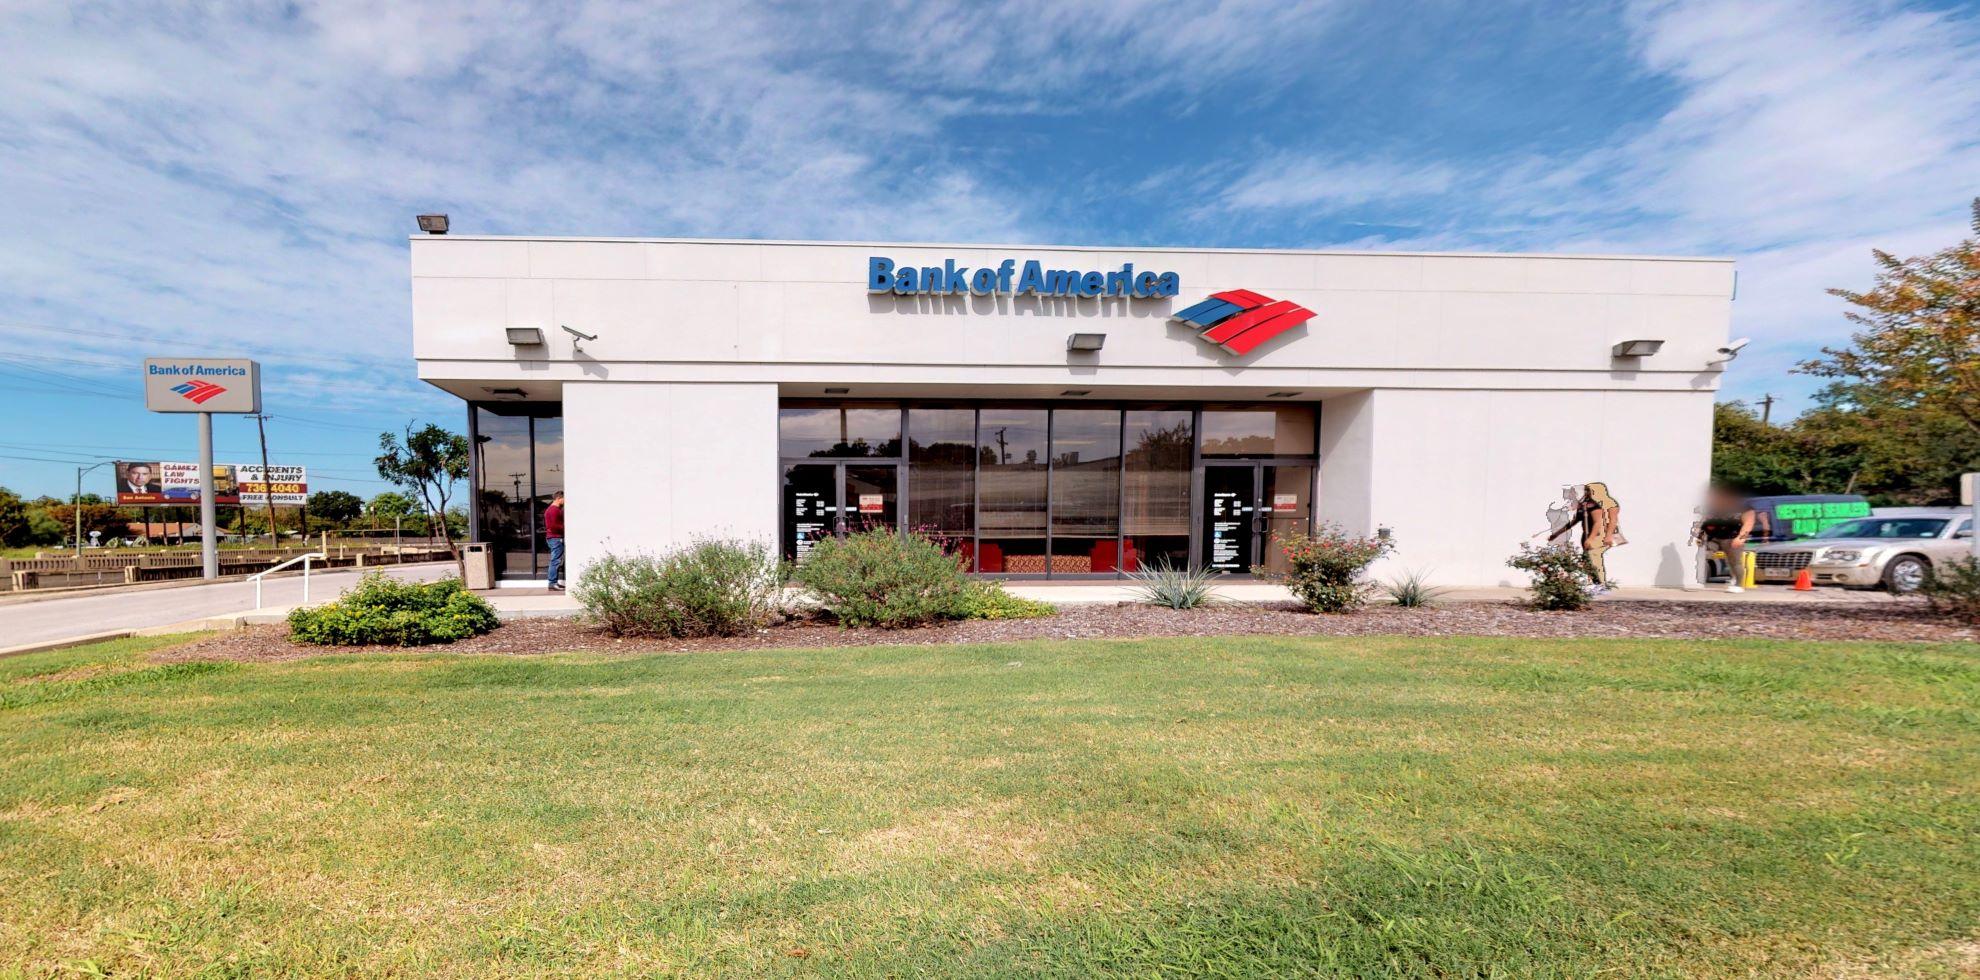 Bank of America financial center with drive-thru ATM | 3500 San Pedro Ave, San Antonio, TX 78212